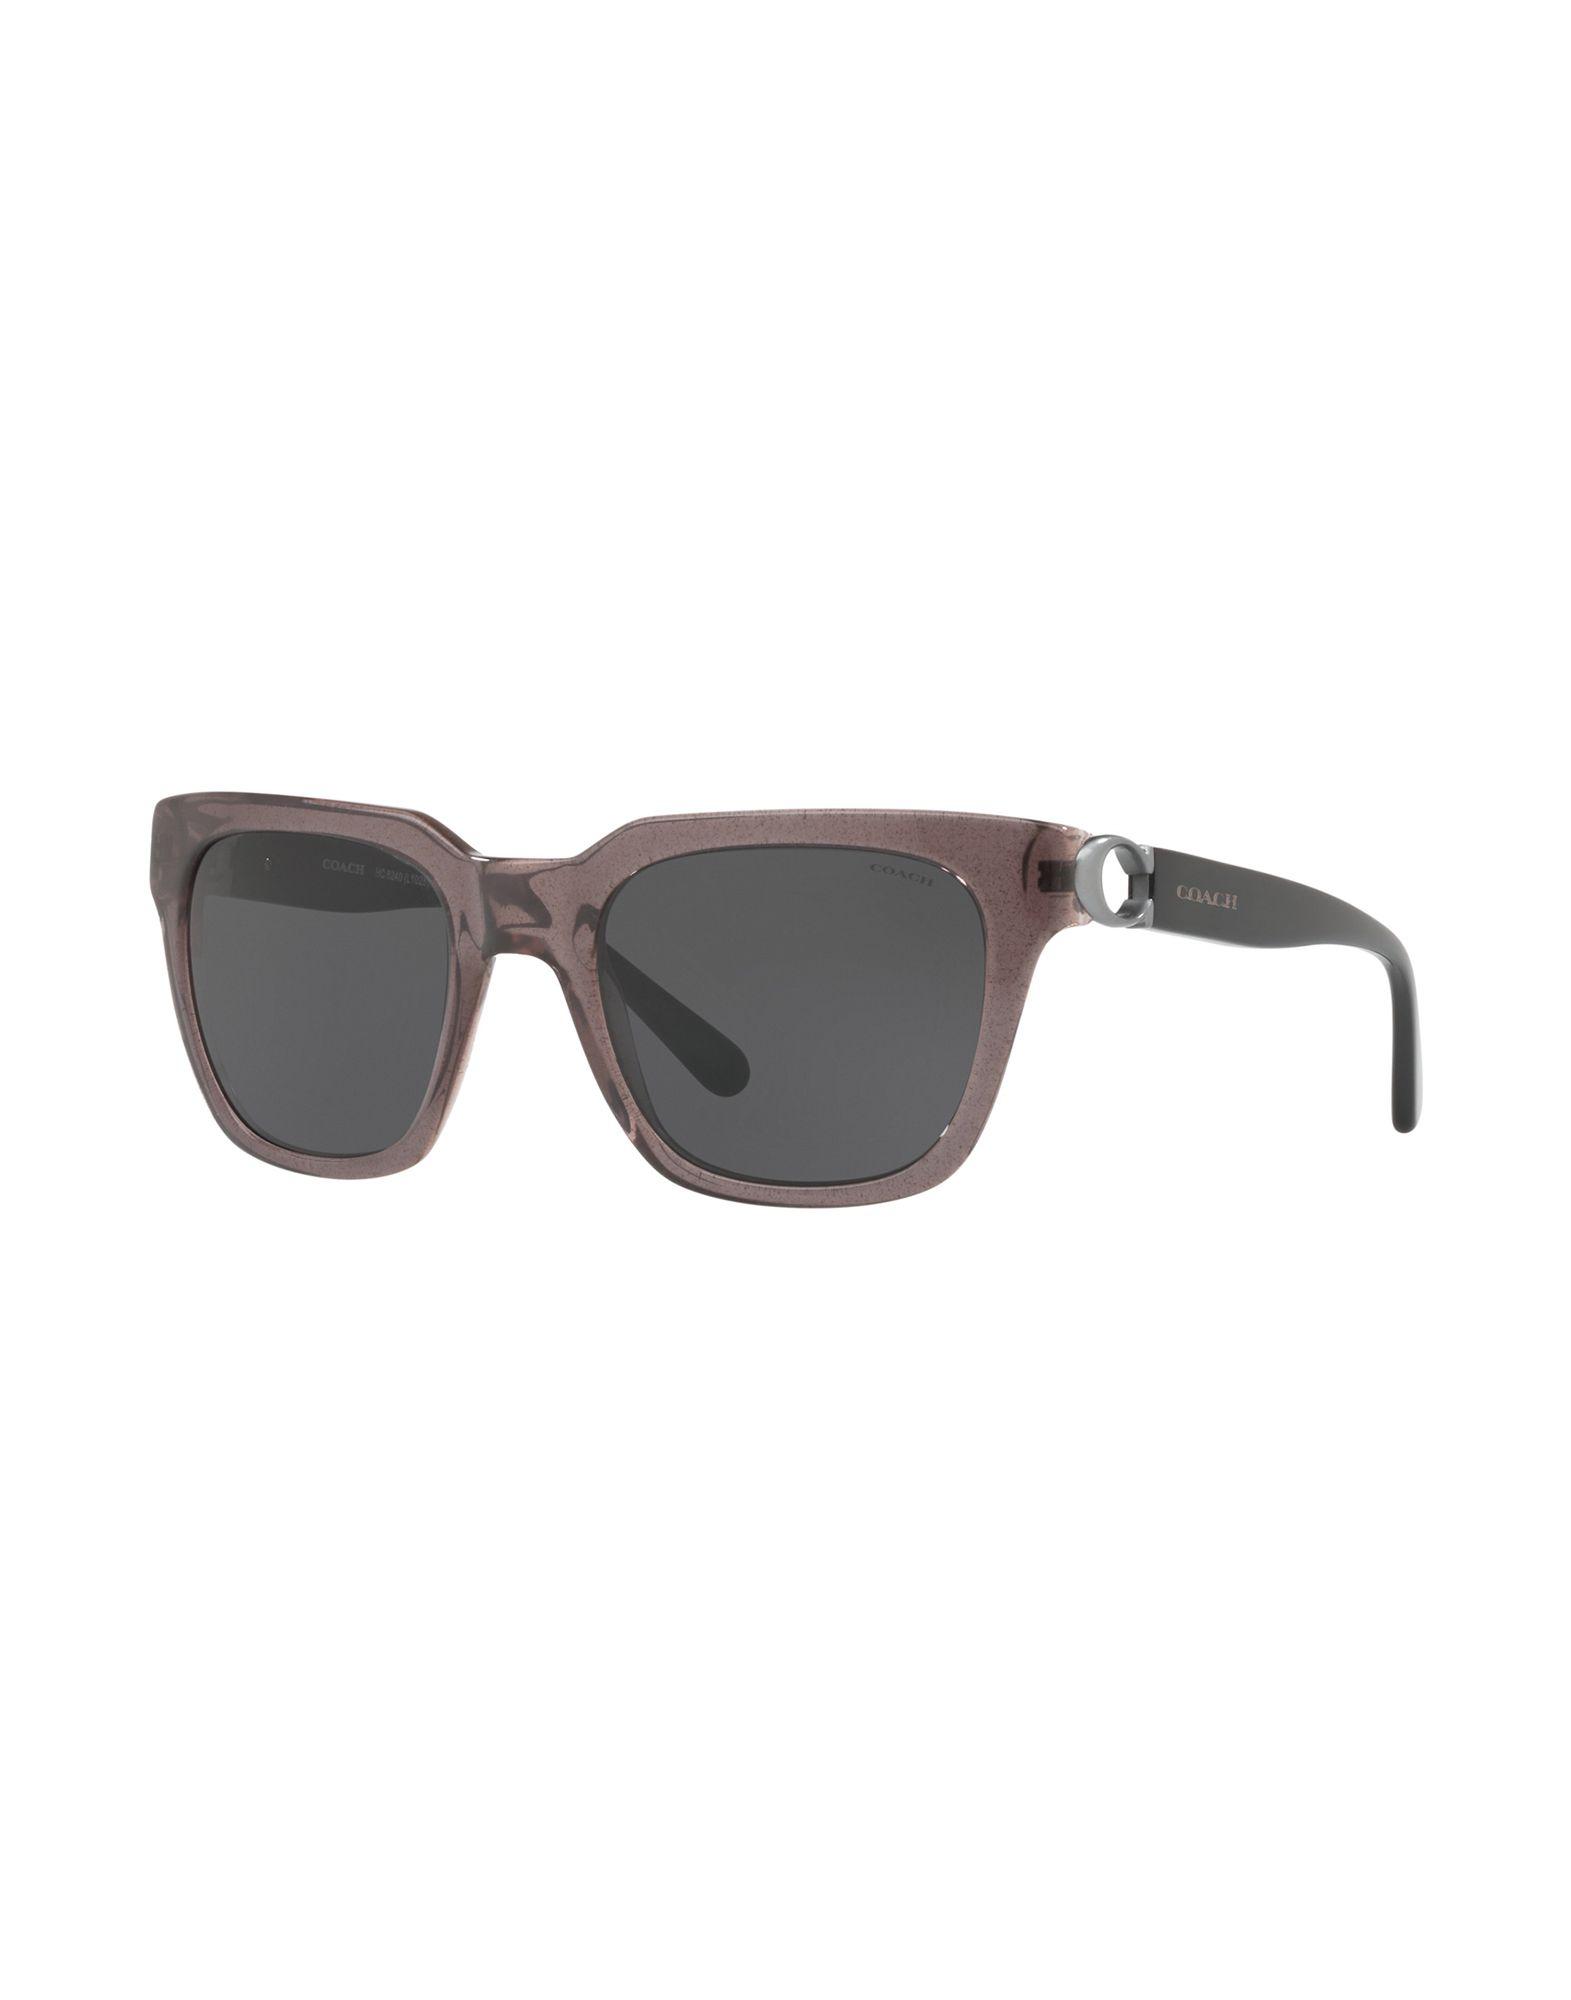 Фото - COACH Солнечные очки 3d очки